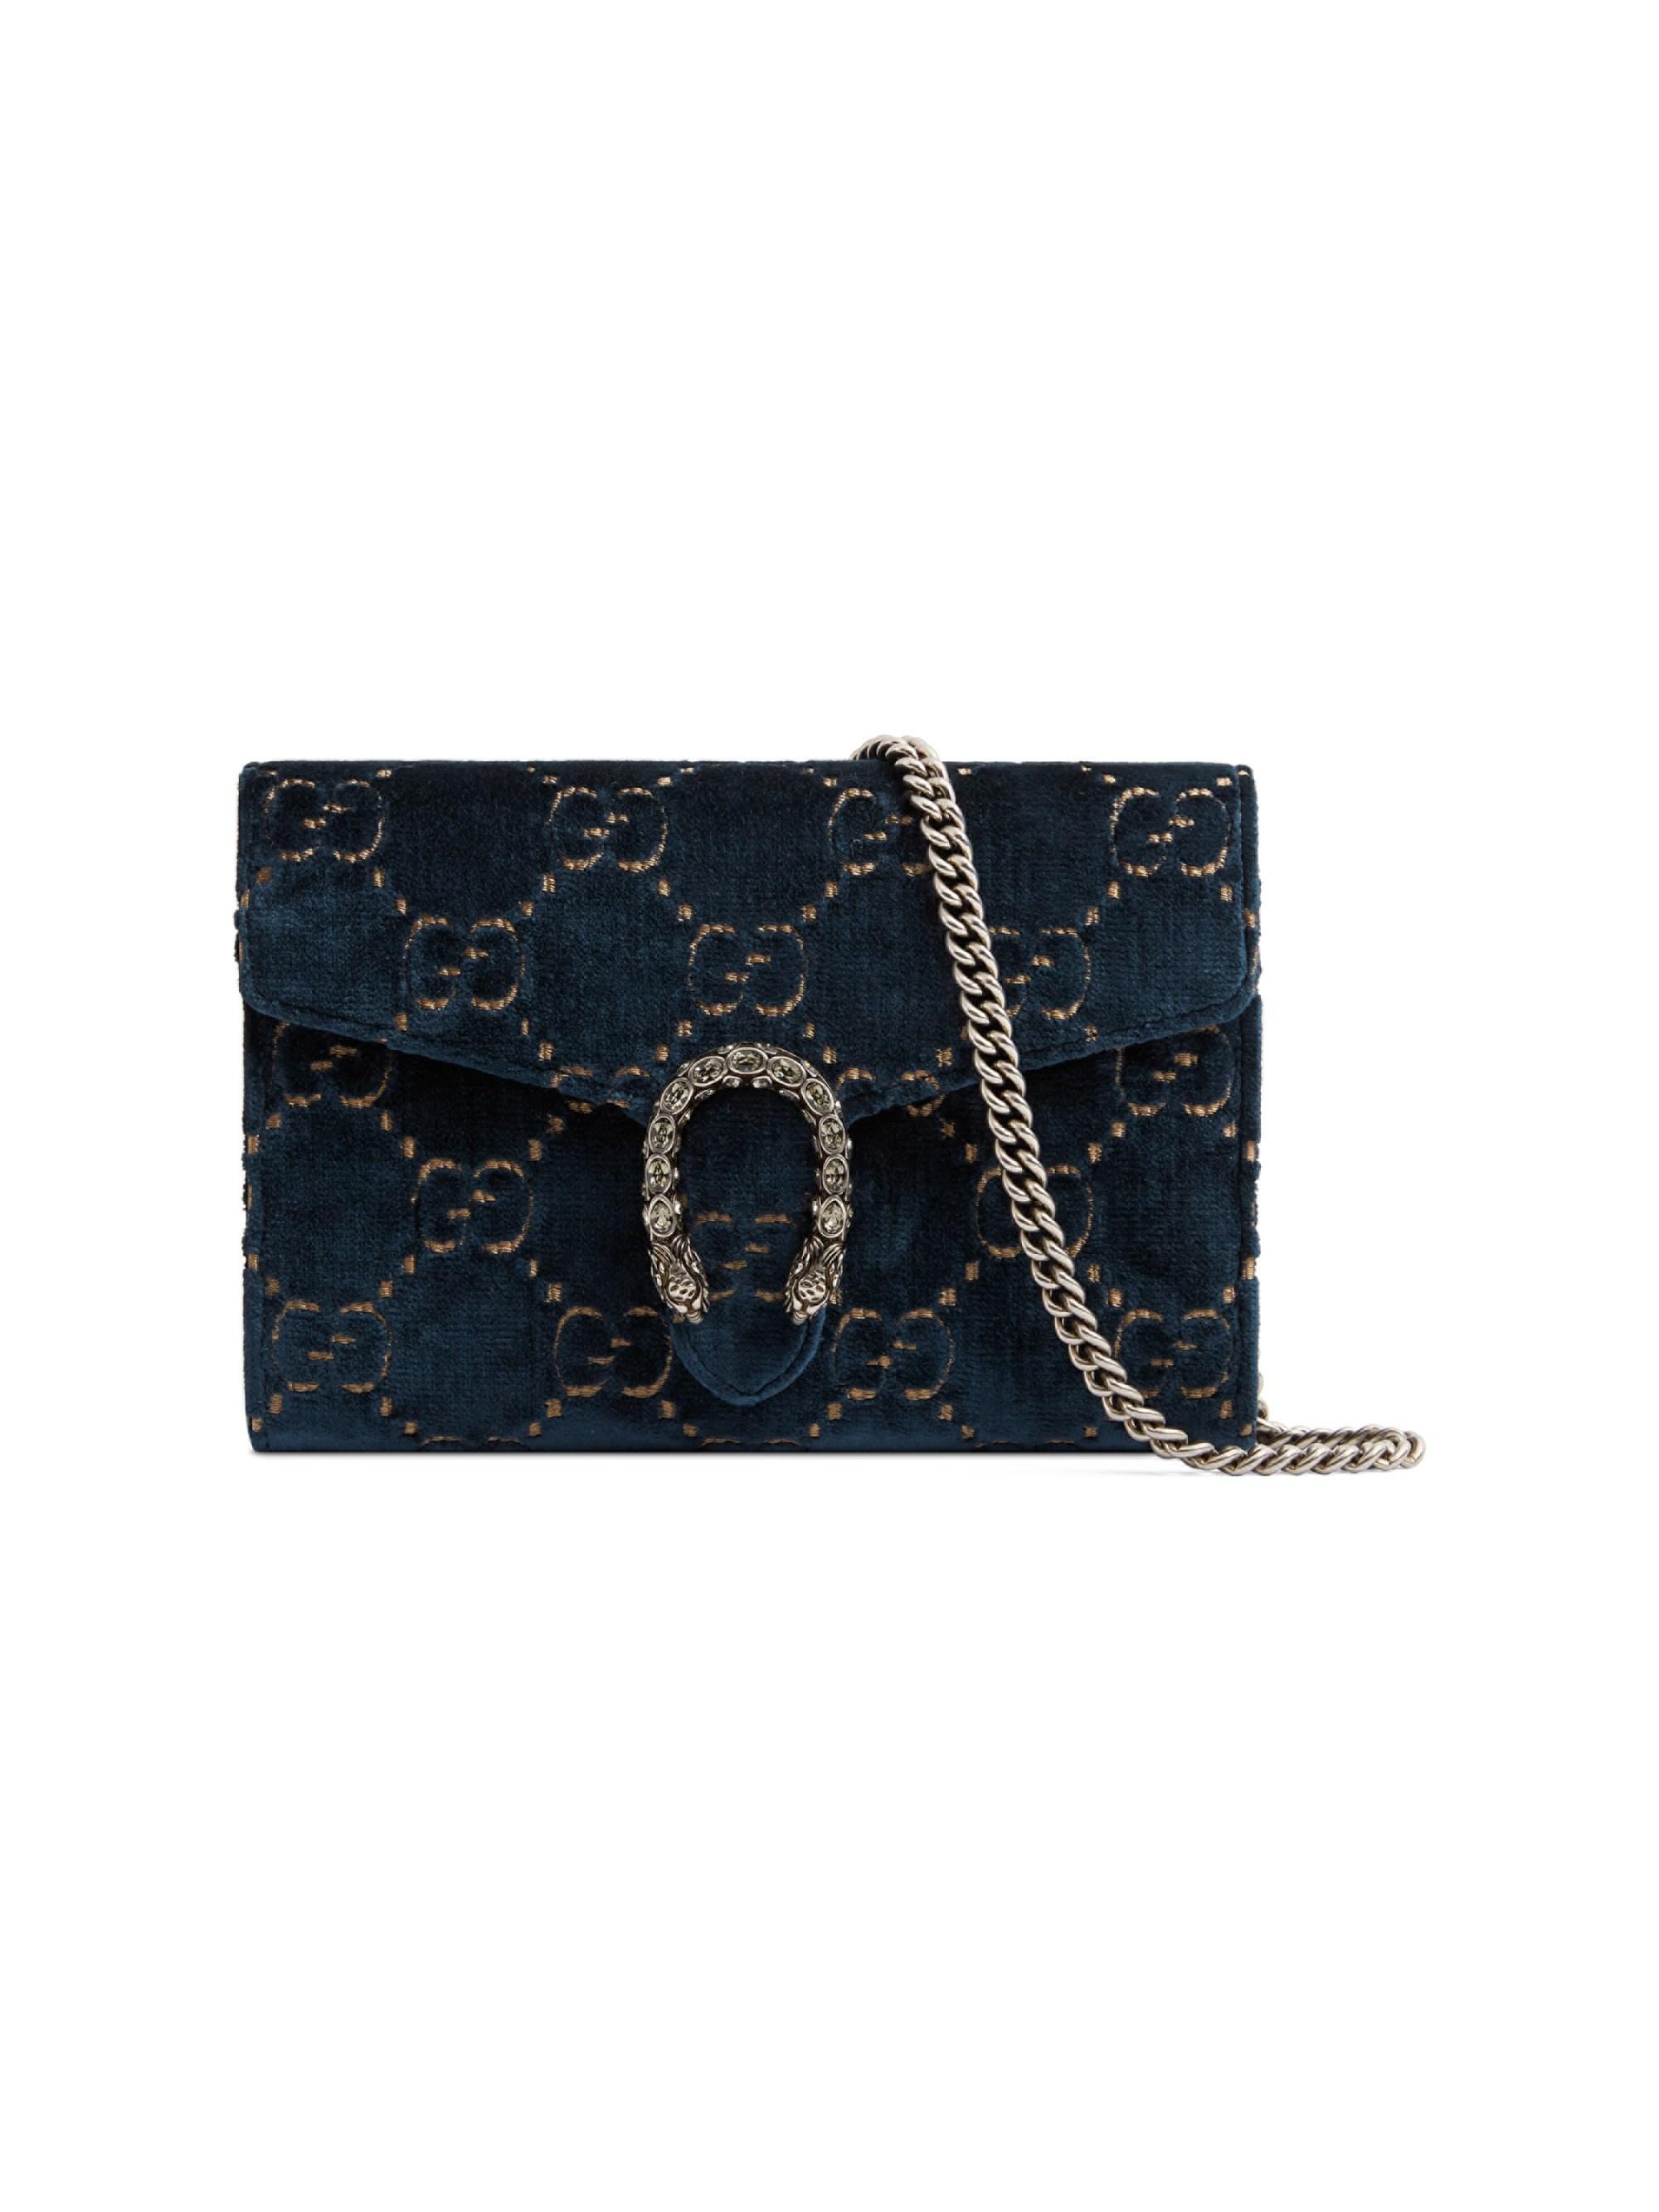 de4e62004e6e Gucci Women's Mini Dionysus Velvet Chain Wallet - Black in Blue - Lyst